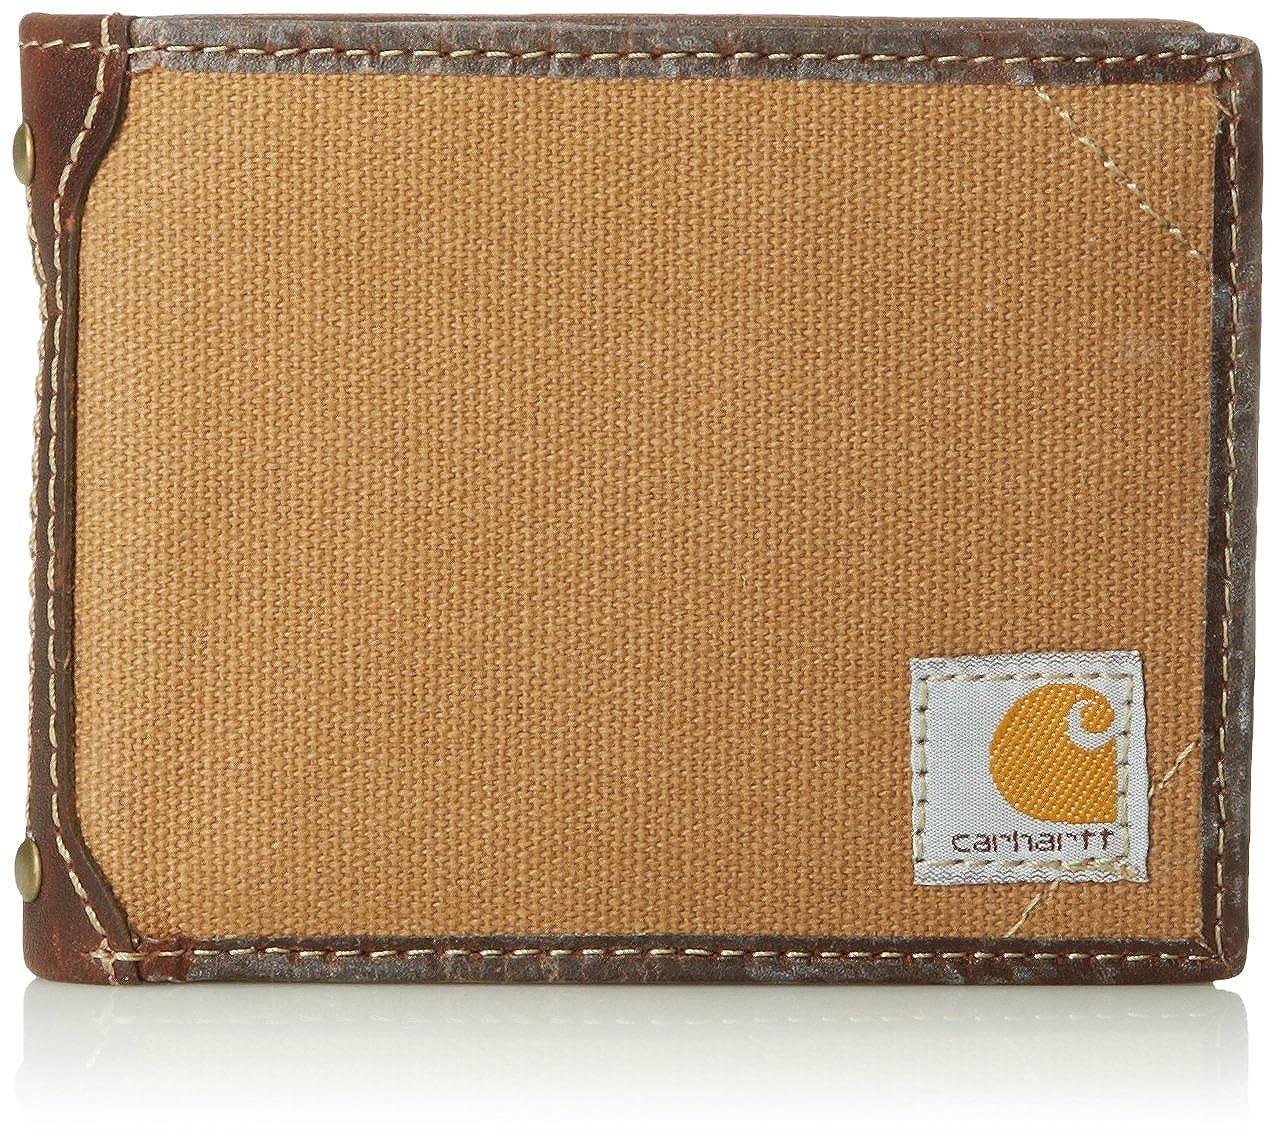 Carhartt Men's Canvas Passcase Wallet Duck Brown One Size 61-2216-20